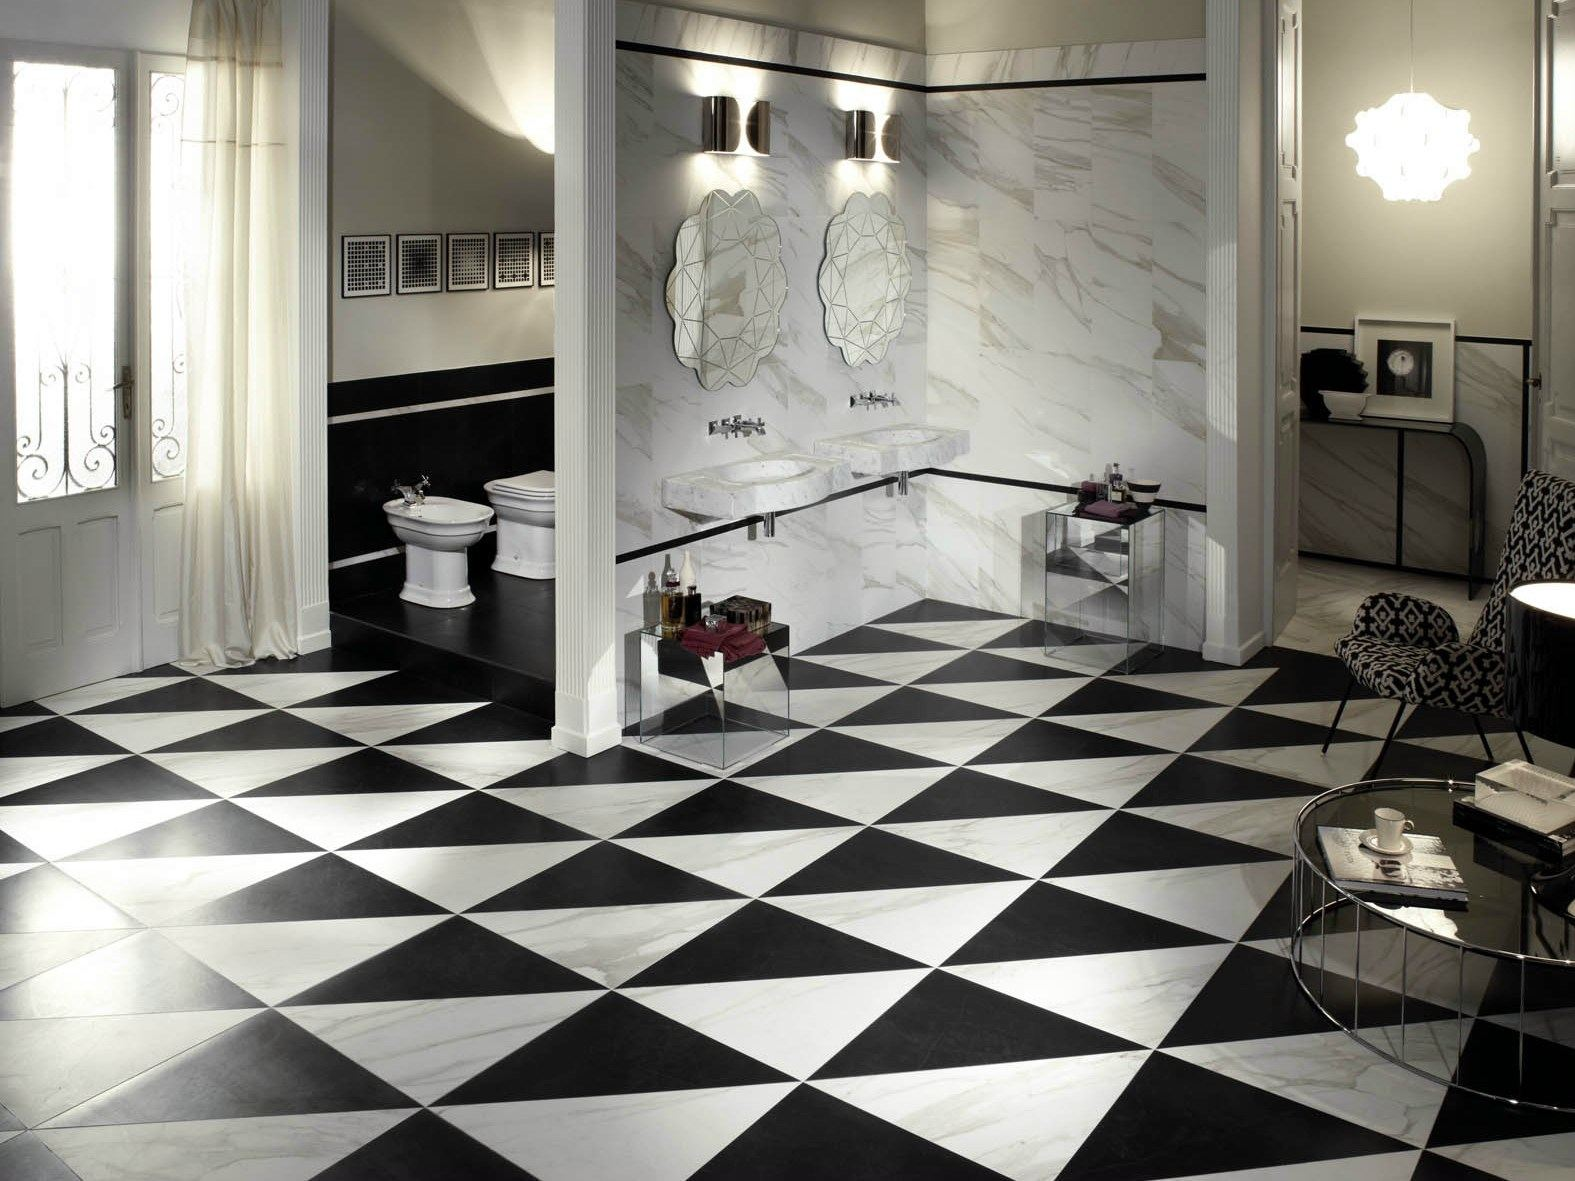 rev tement de sol en gr s c rame effet marbre. Black Bedroom Furniture Sets. Home Design Ideas